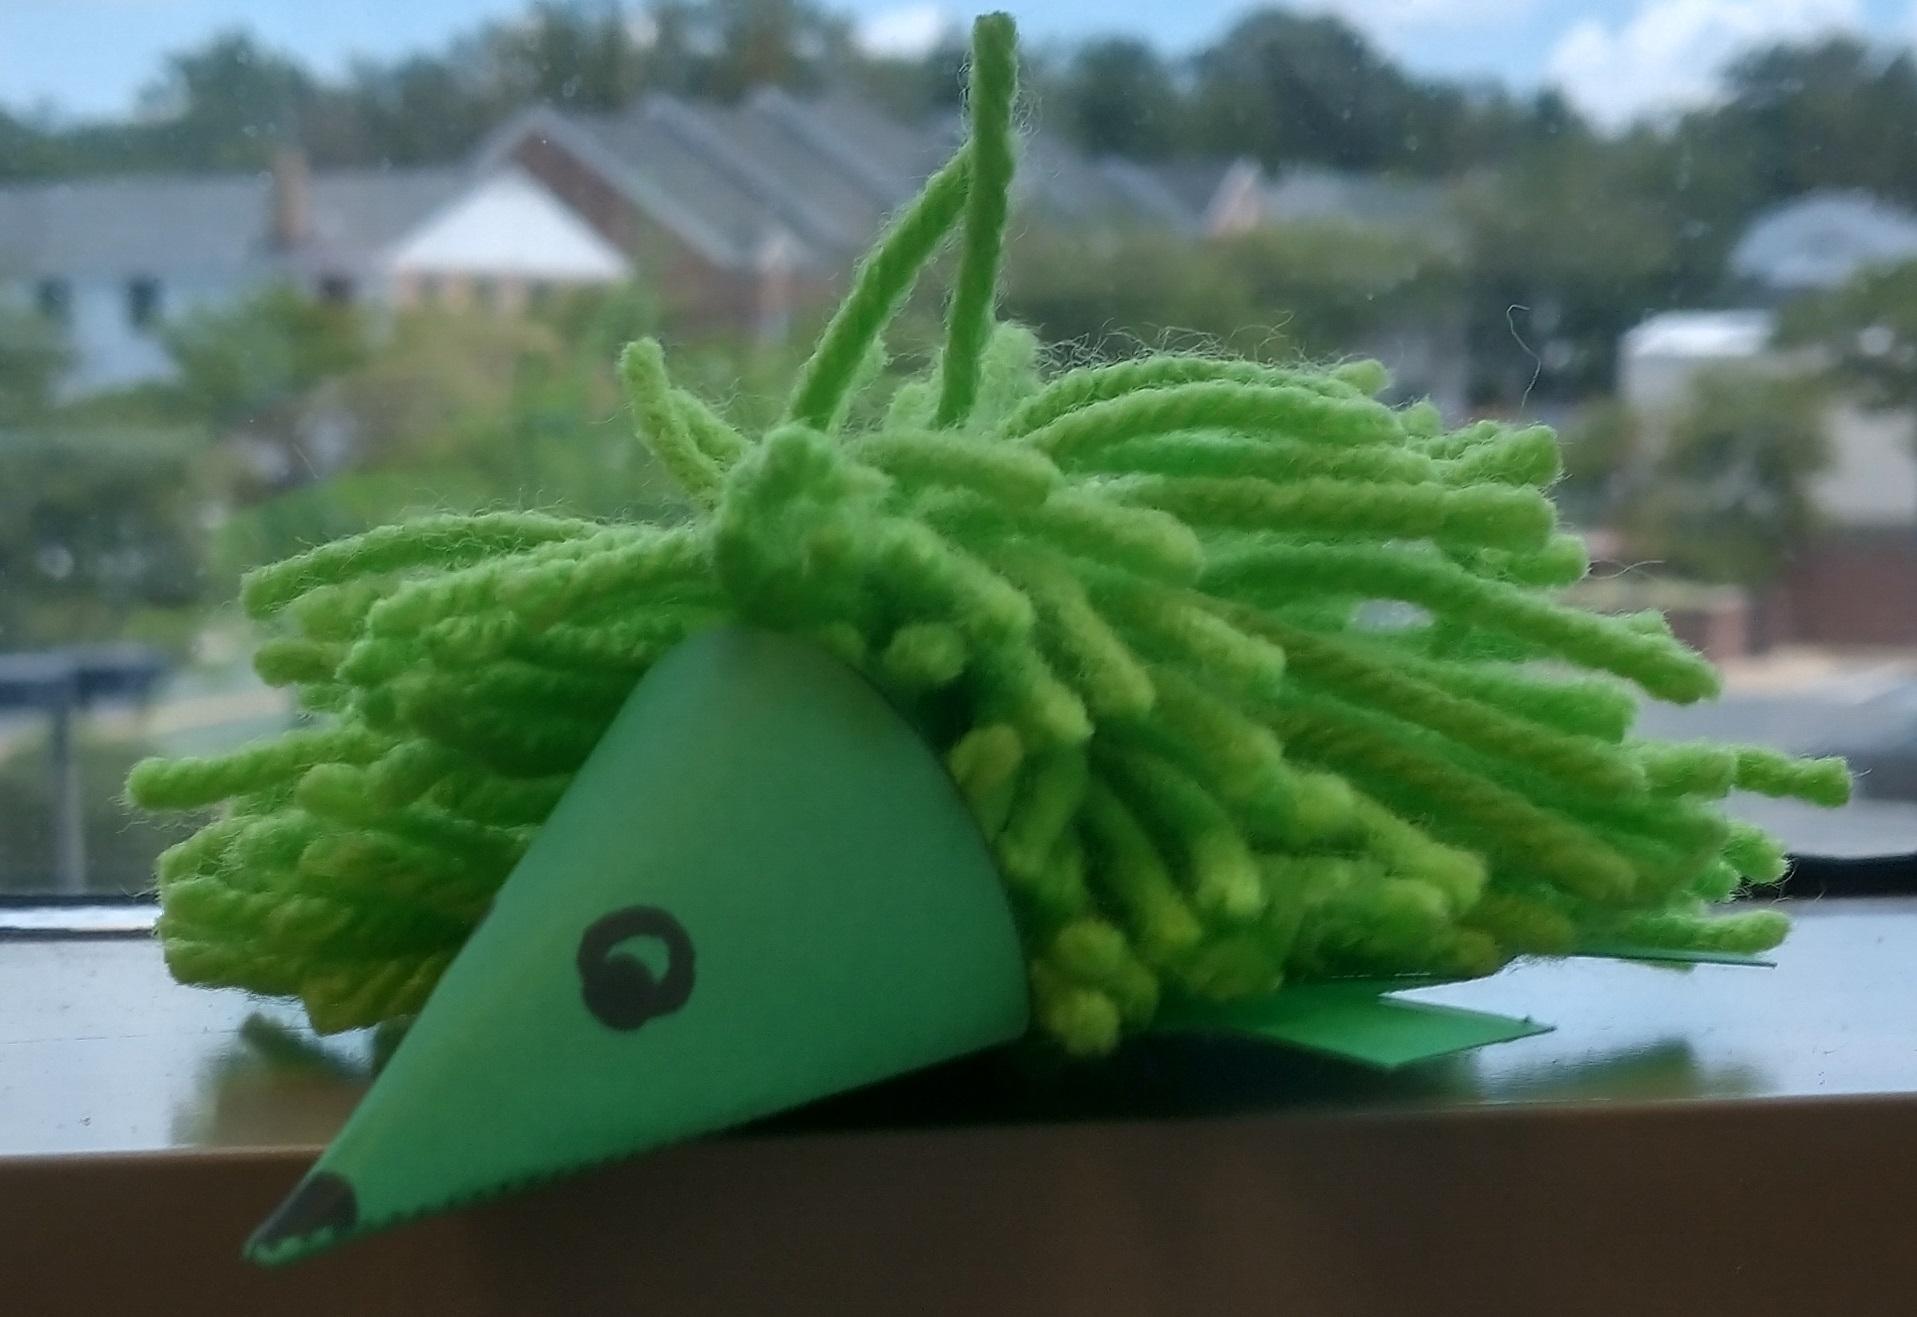 Image is a pompom hedgehog